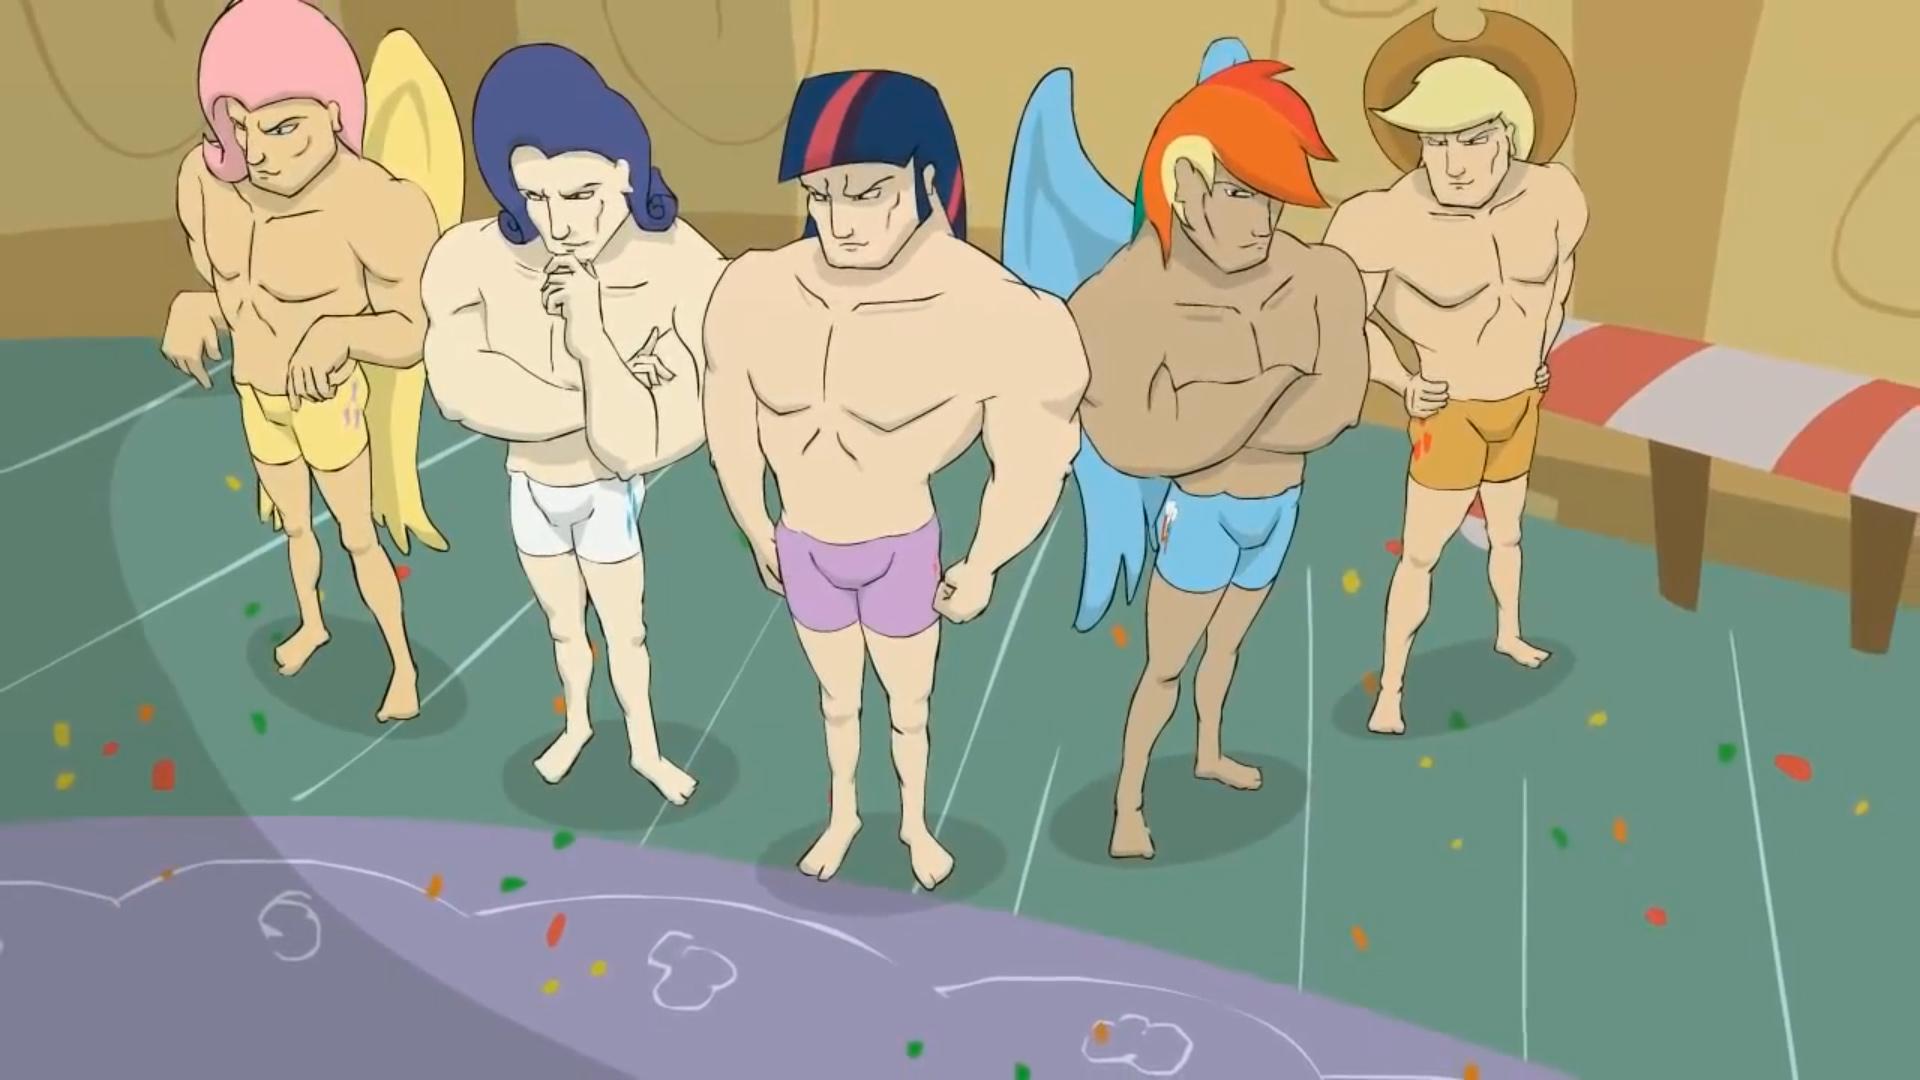 disturbing-manly-my-little-pony-animated-short.jpg